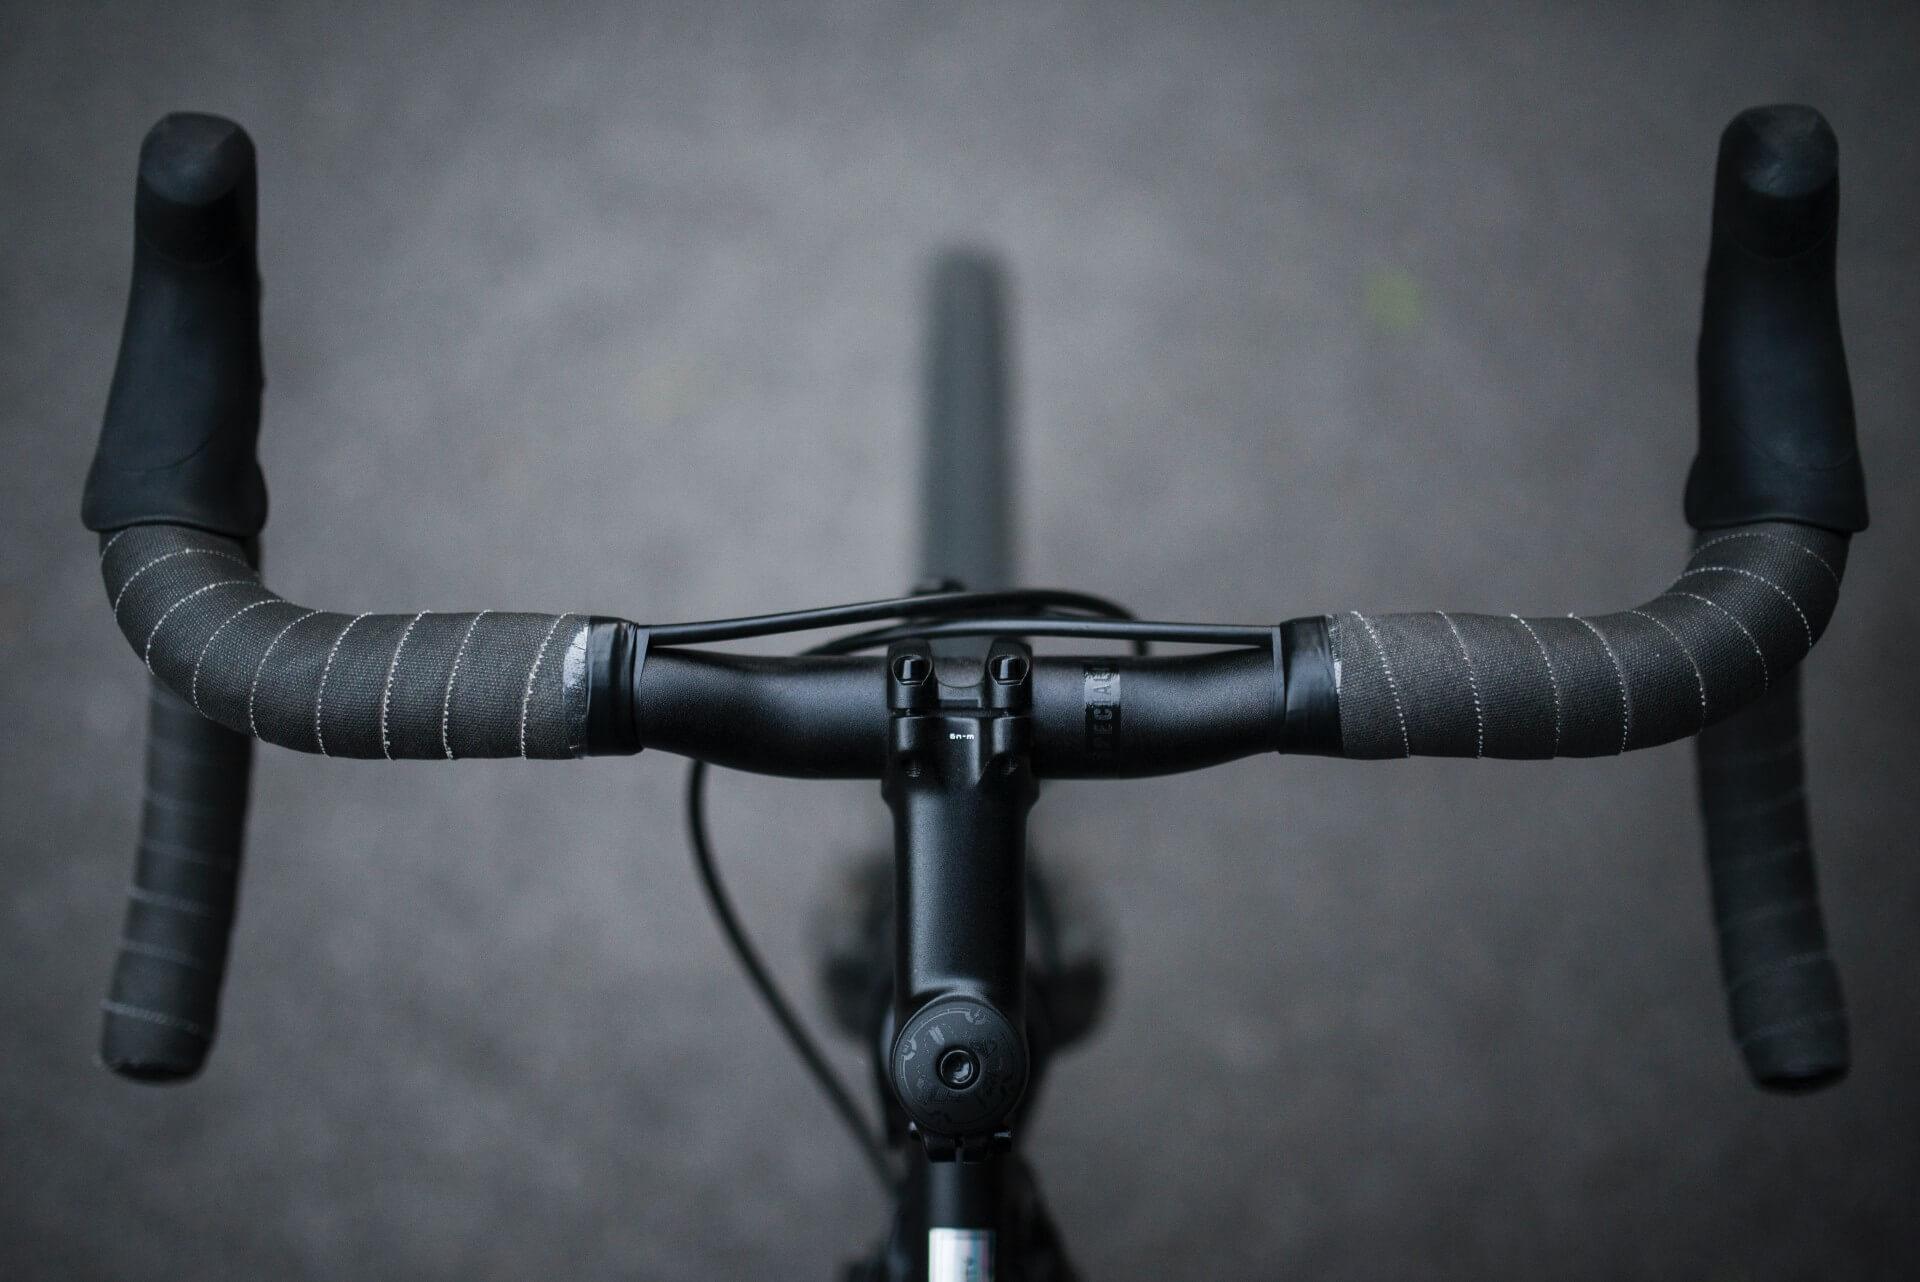 Overhead view of bicycle handlebars